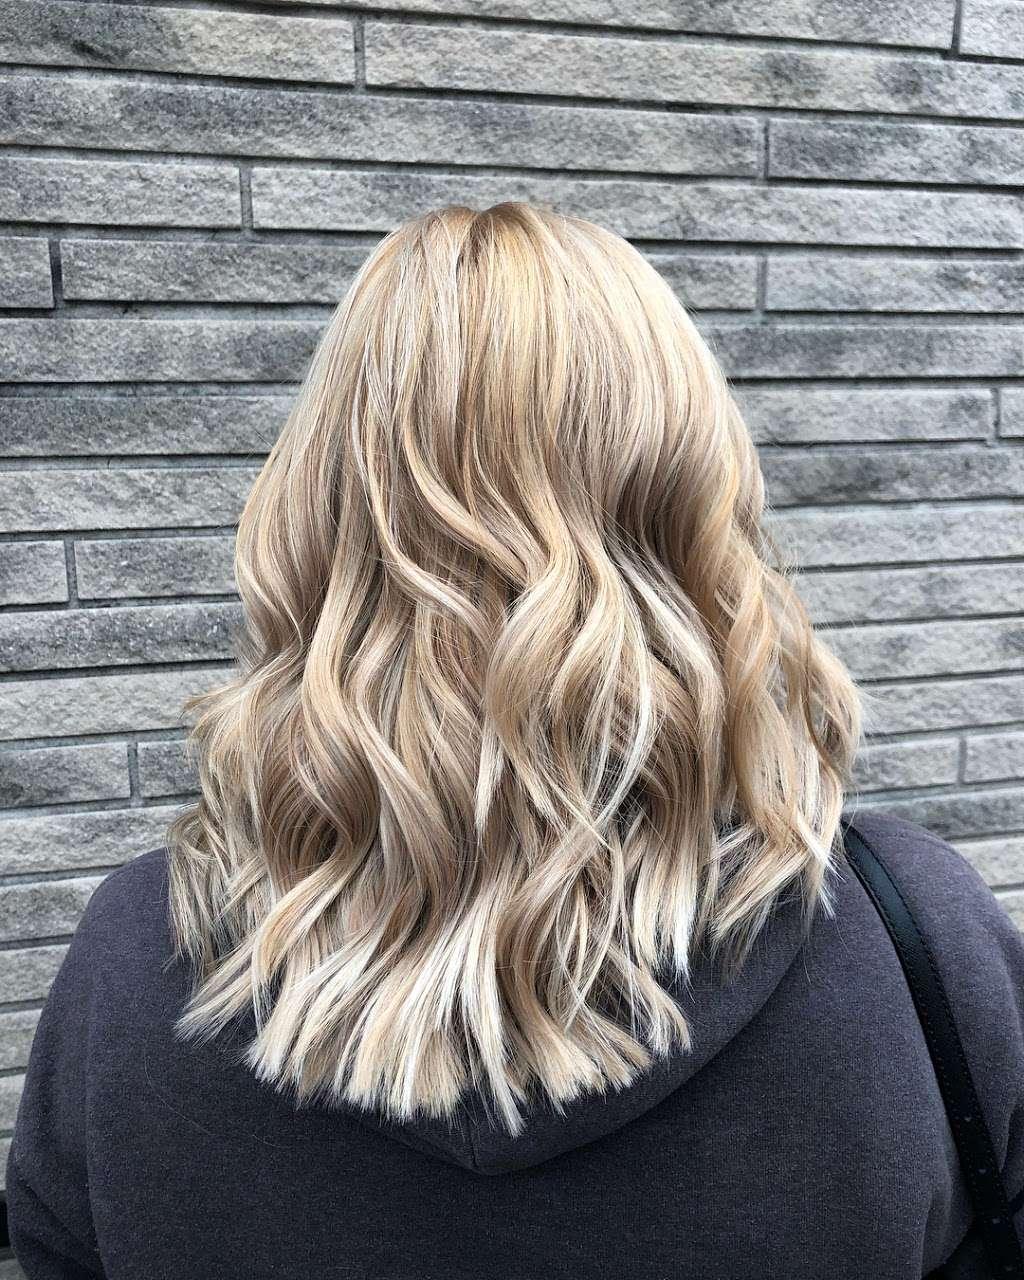 Identity Hair Salon - Hair care | 8680 W Warm Springs Rd